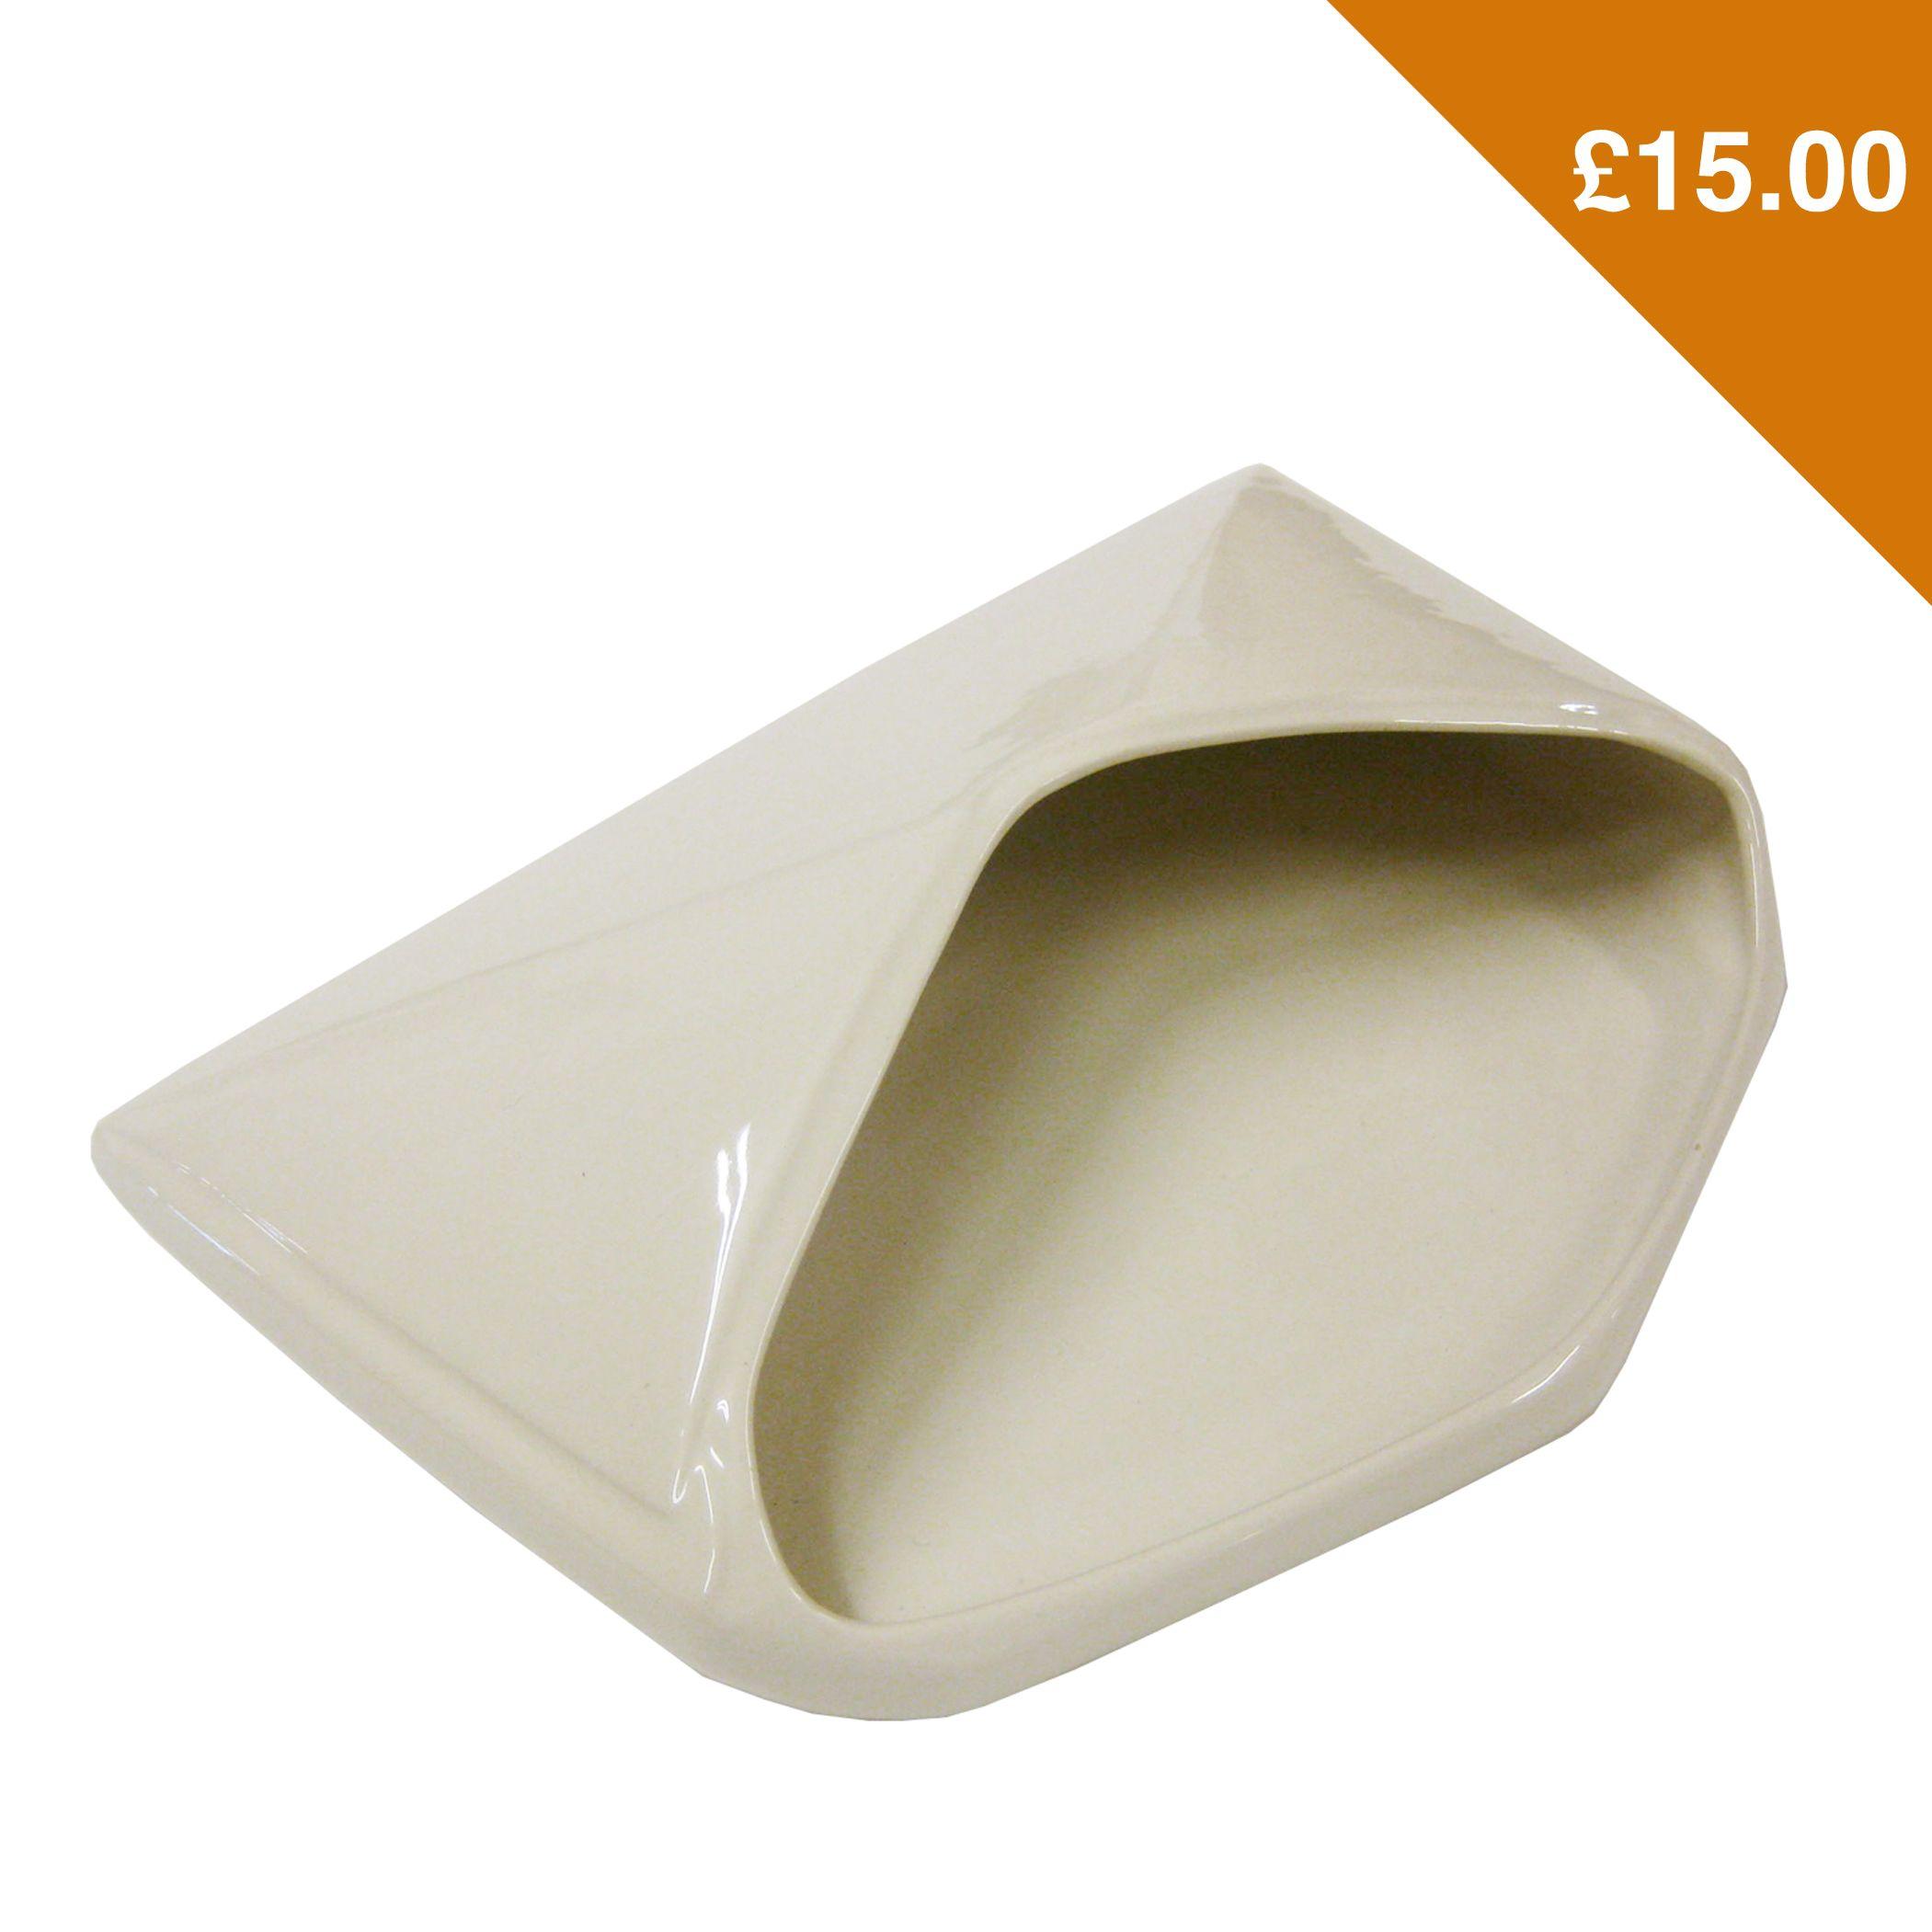 ceramic envelope for important desk stuffs